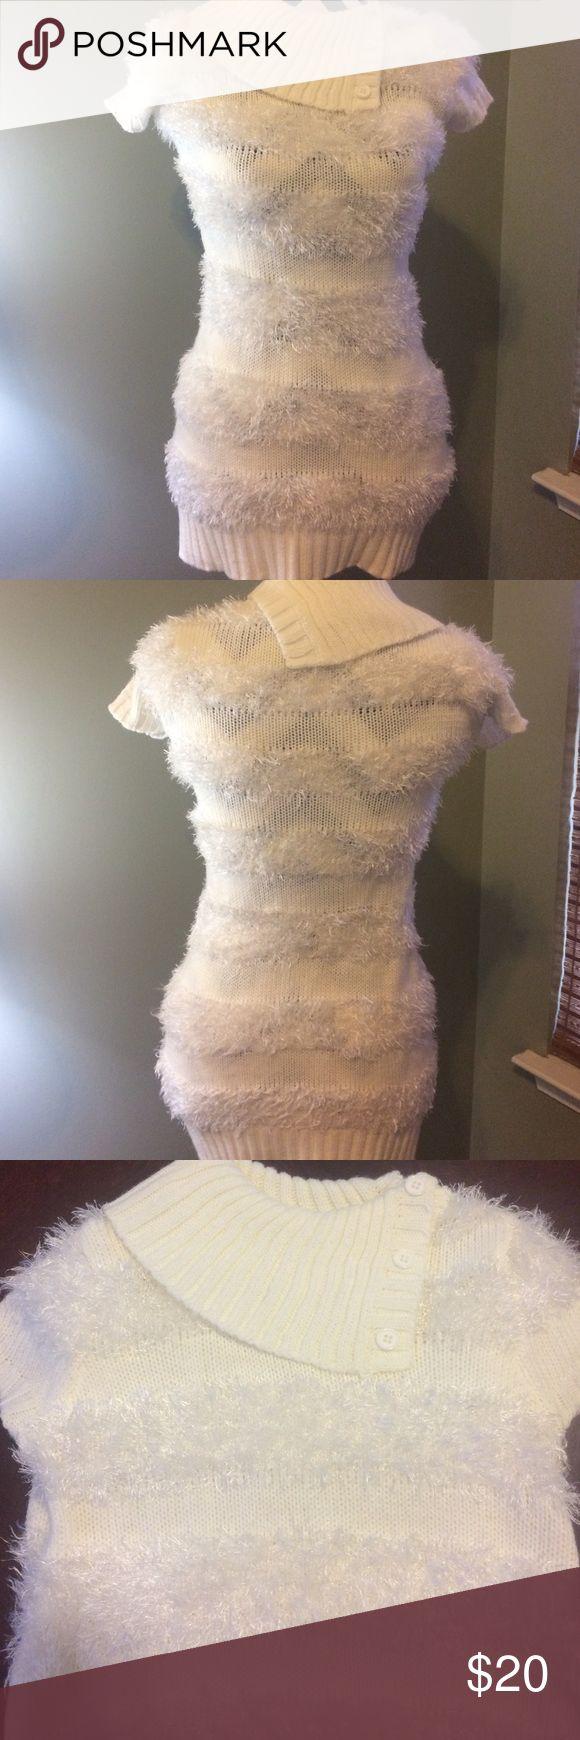 Cream color Dress Cream color dress Dresses Formal